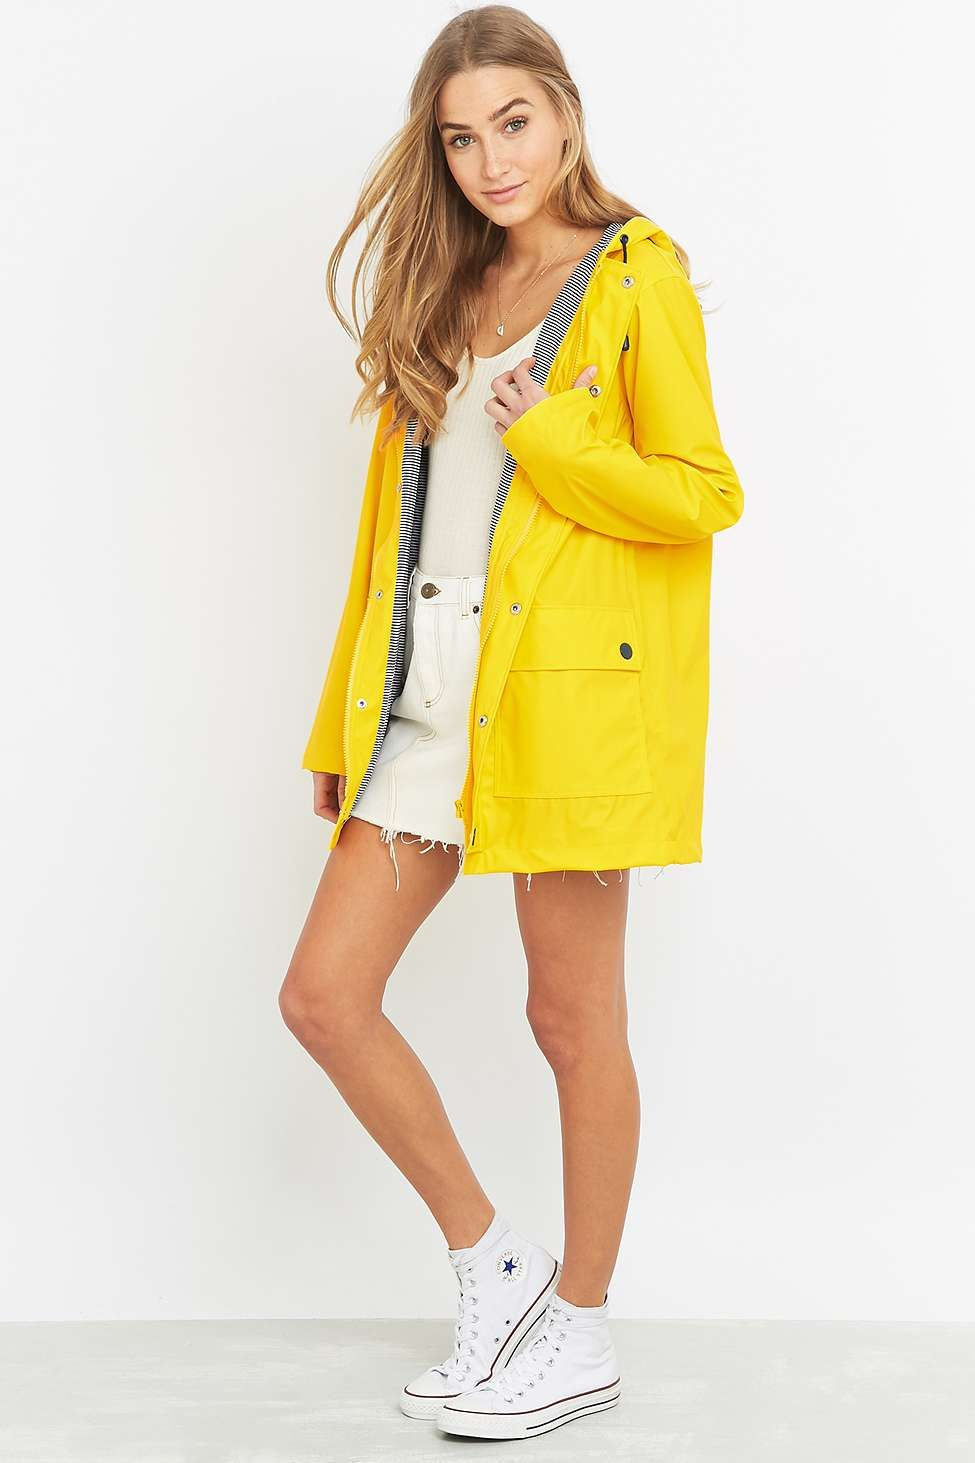 Petit Bateau Yellow Anorak In 2019 Style Inspiration